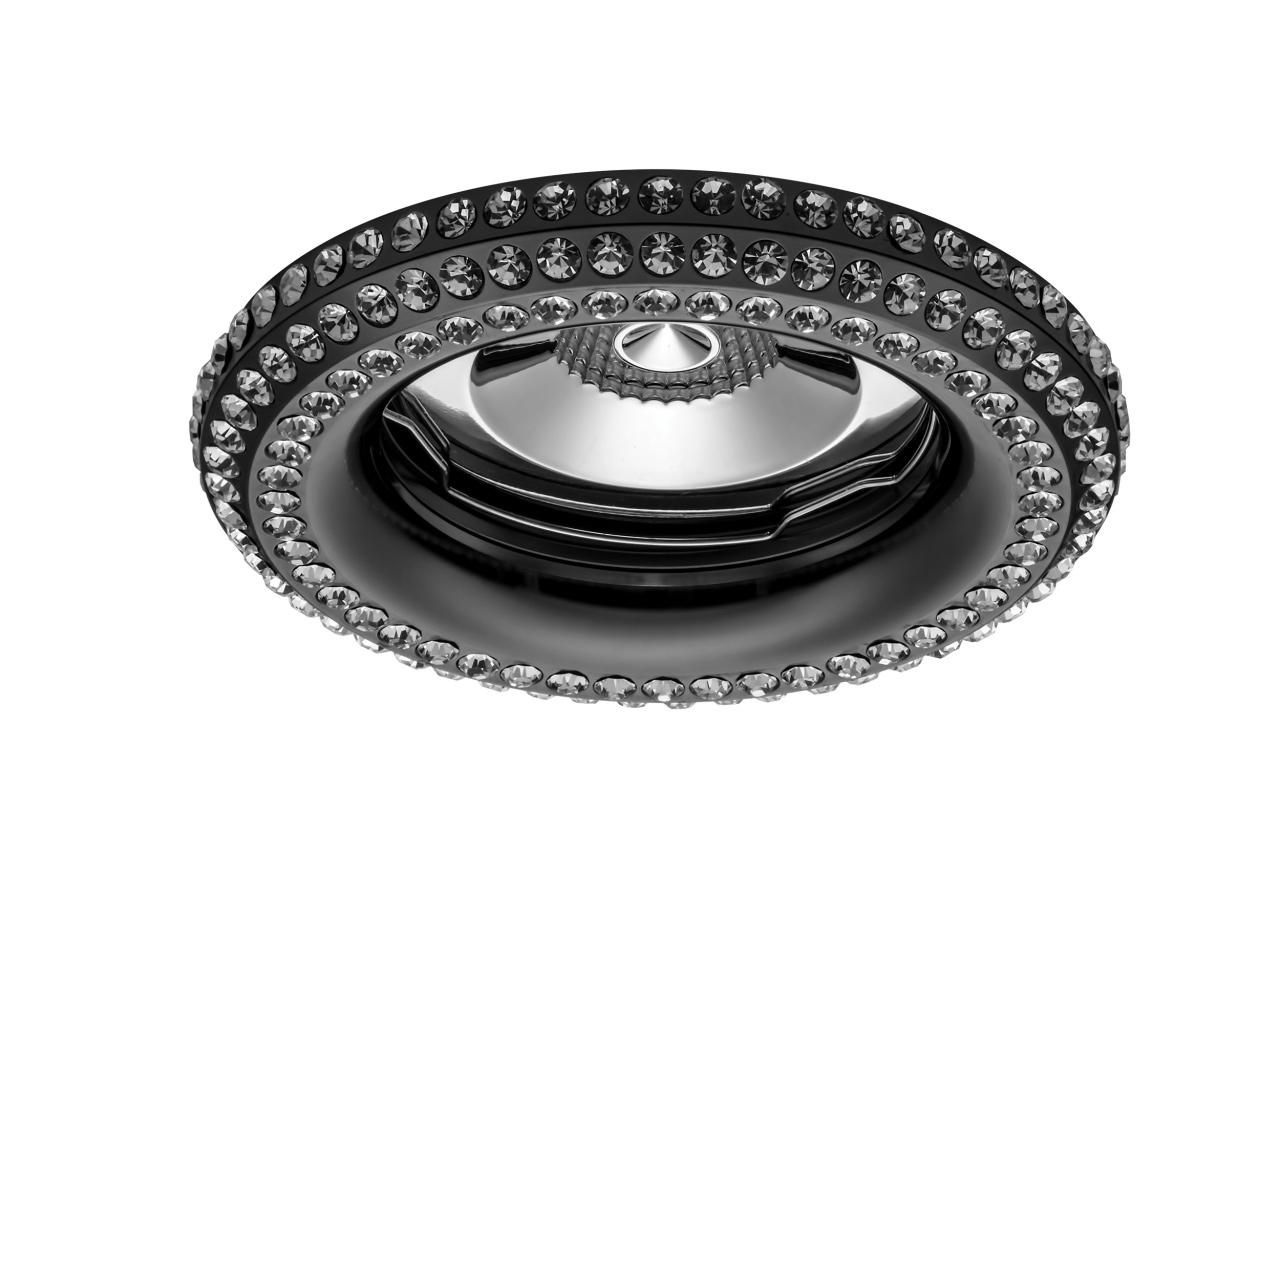 Светильник Miriade MR16 / HP16 черный хром Lightstar 011997